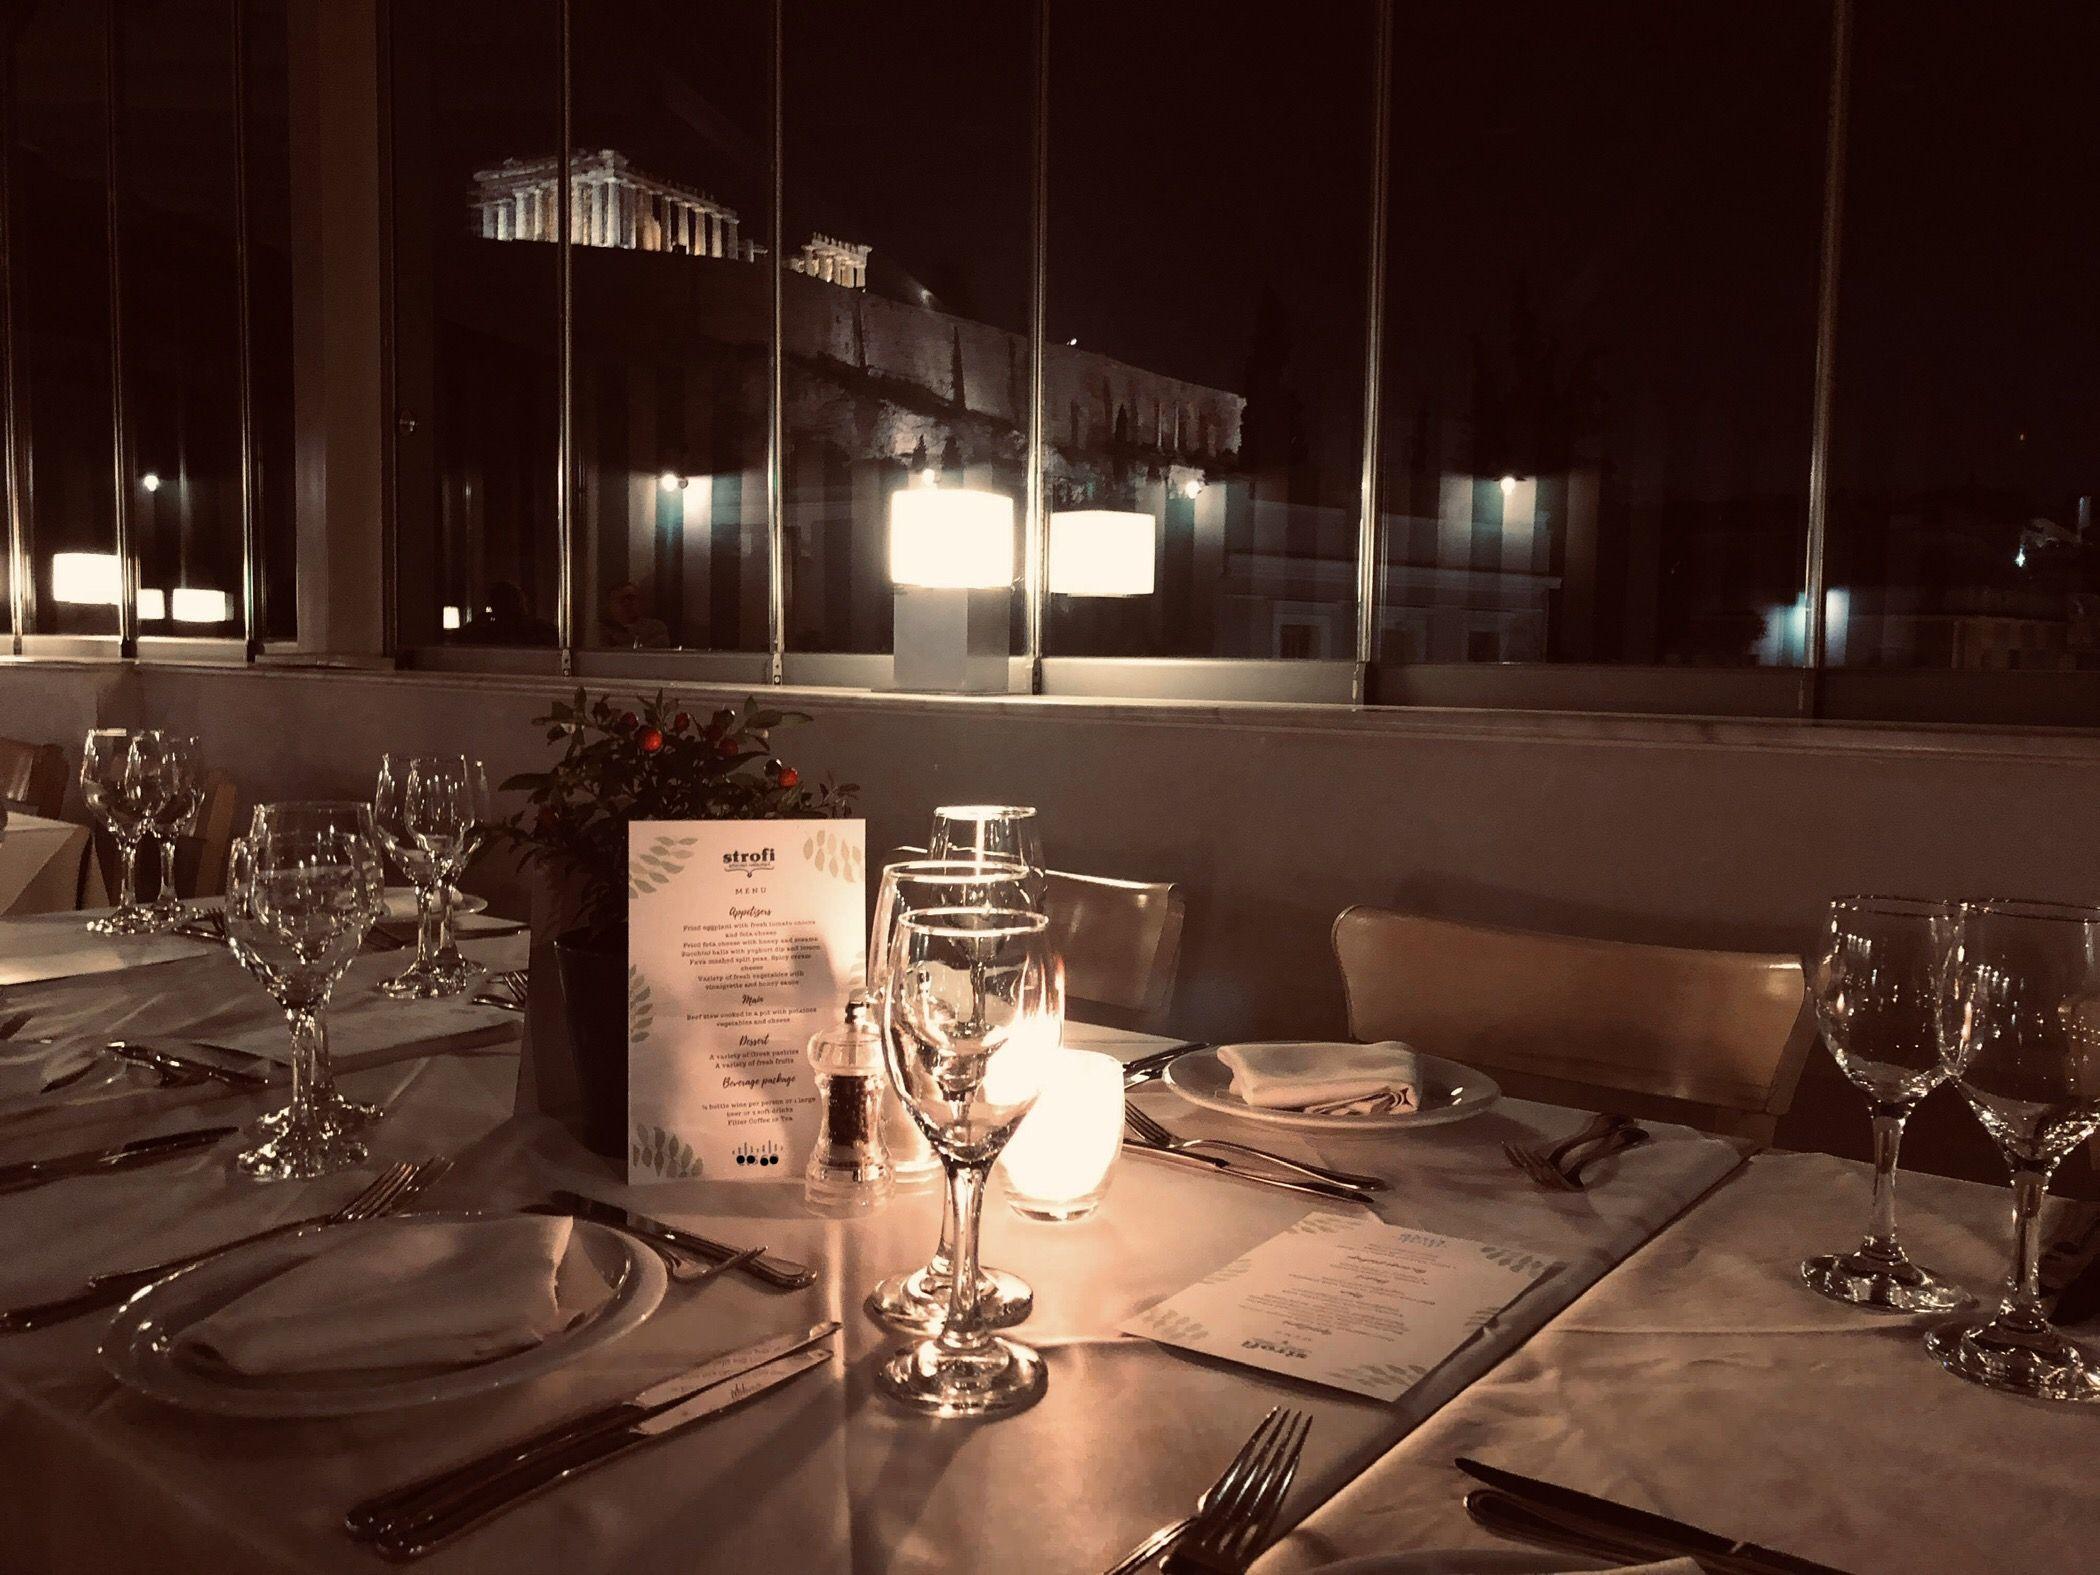 #strofi #restaurant #athensgreece #dinner  #dining #greece #corporateevents